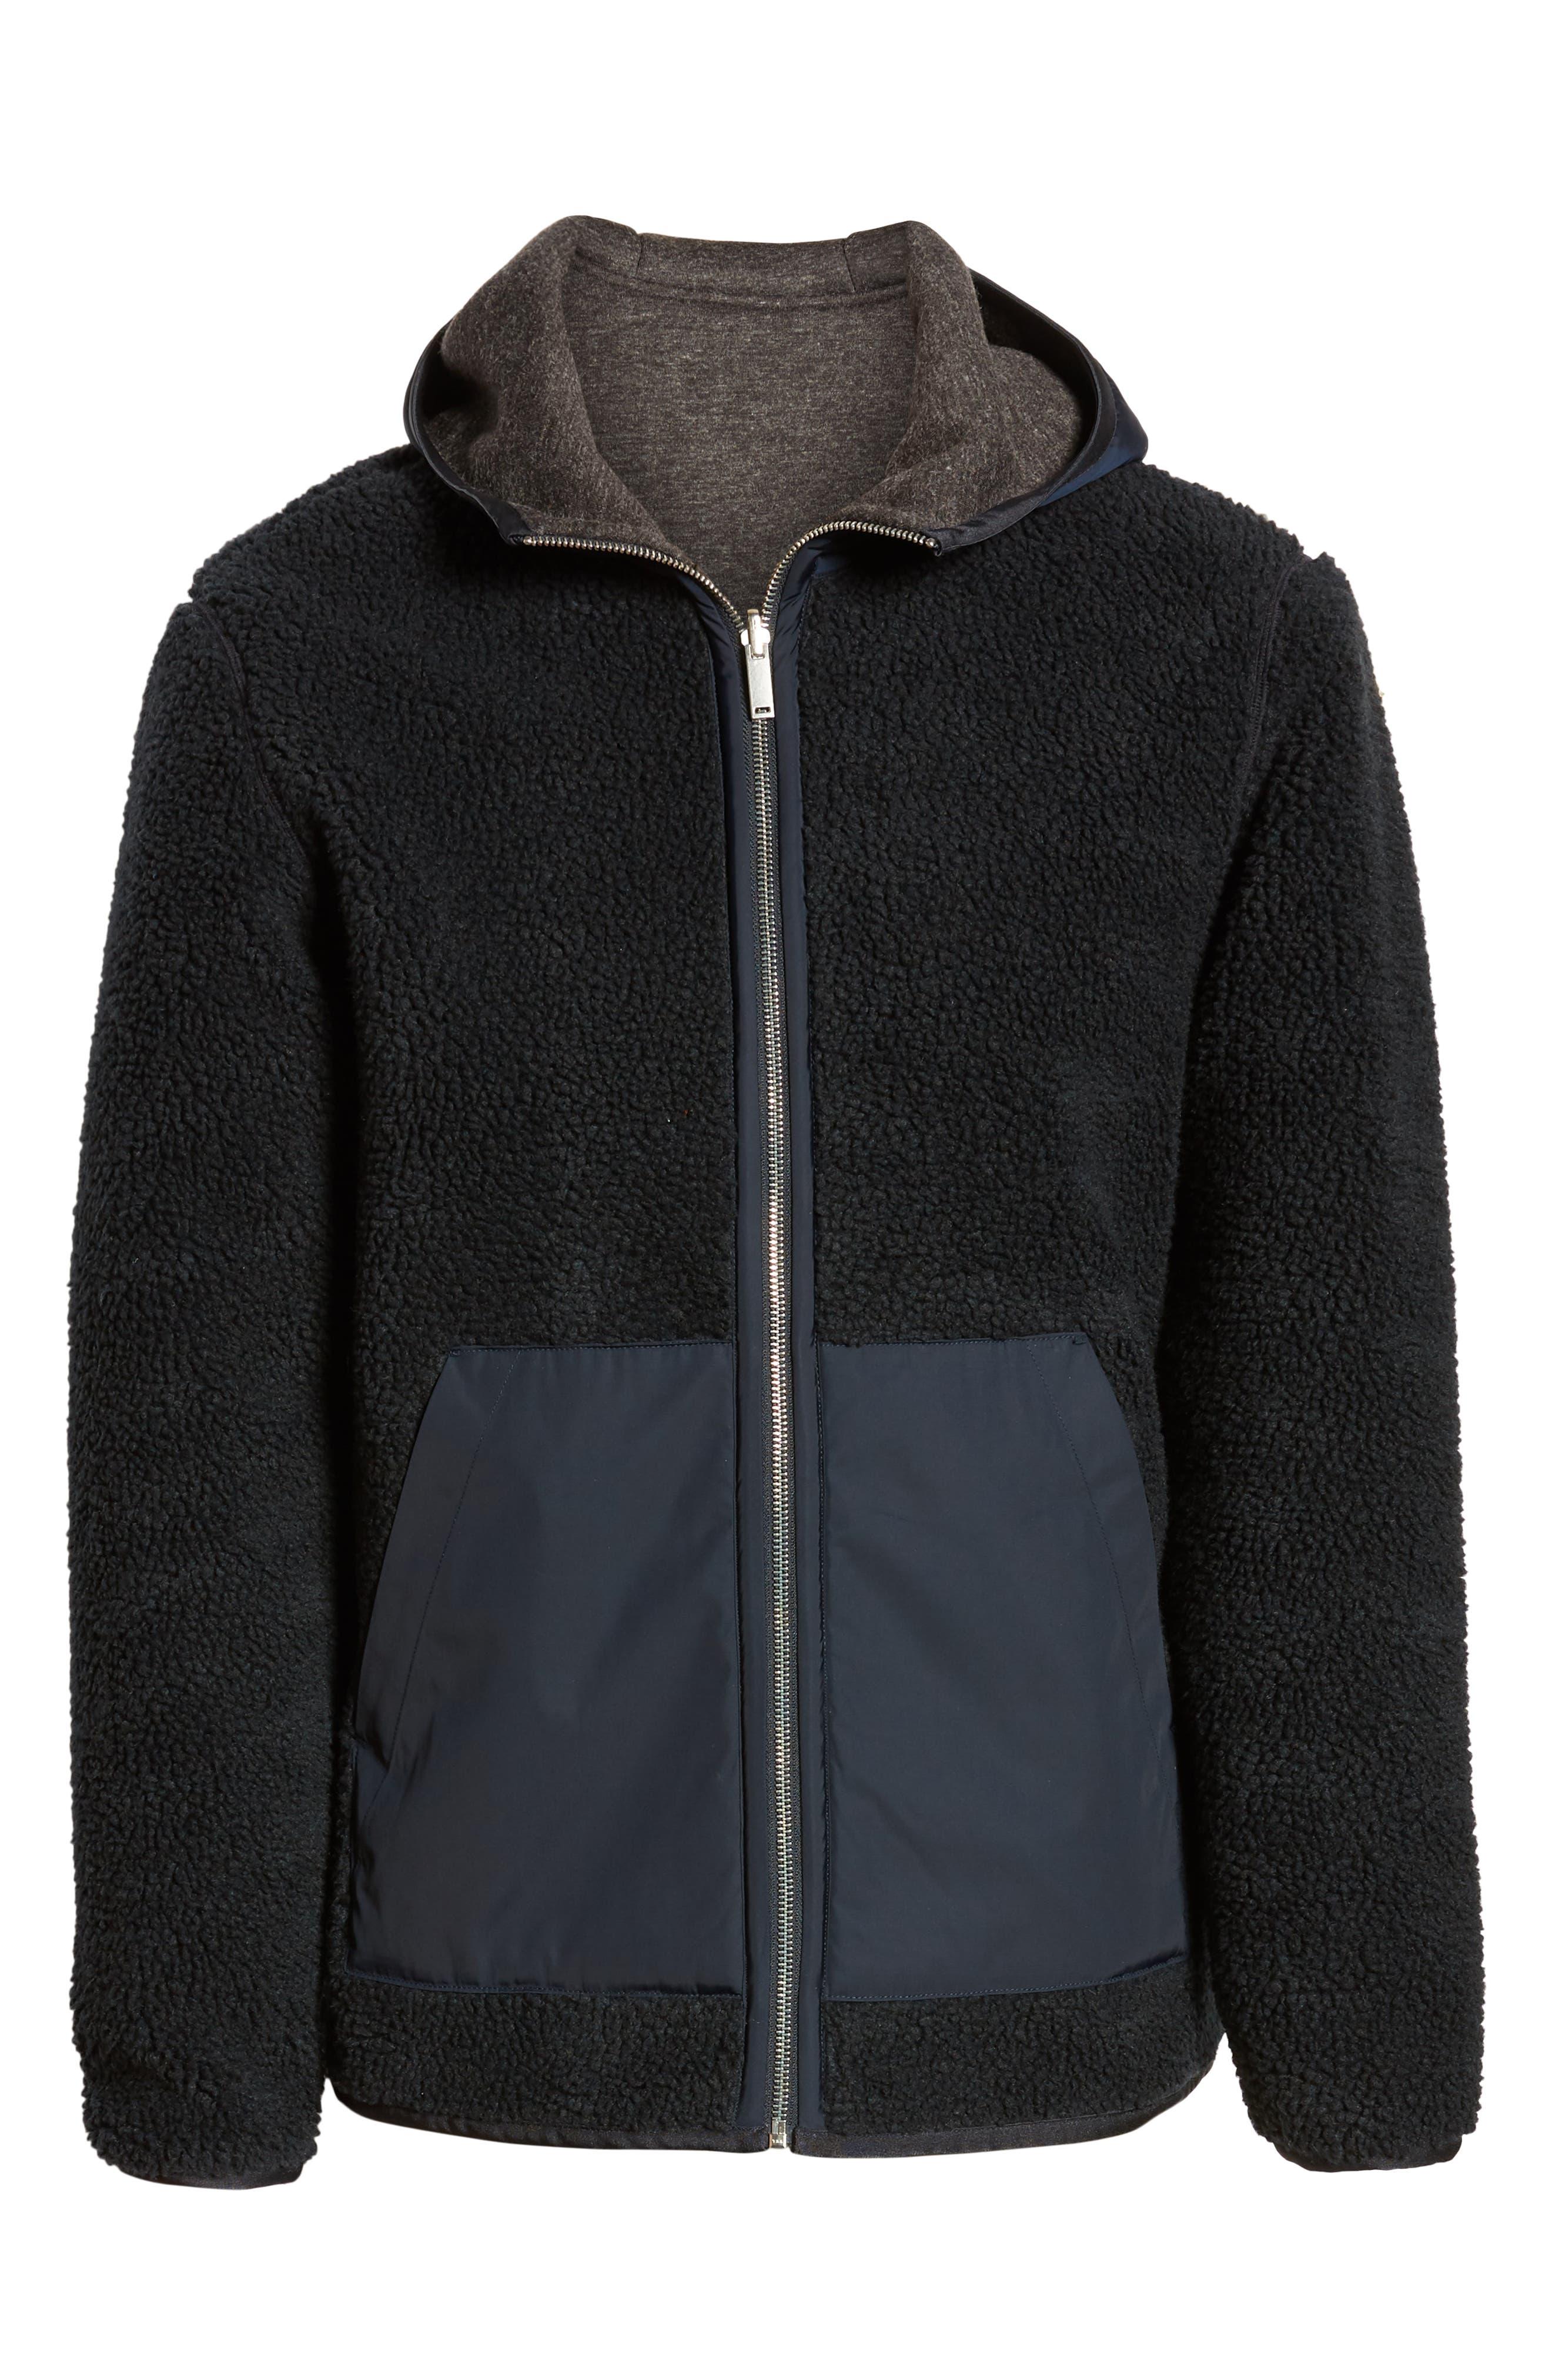 THEORY,                             Polar Fleece Reversible Zip Hoodie,                             Alternate thumbnail 8, color,                             ECLIPSE/ ASHPALT MELANGE